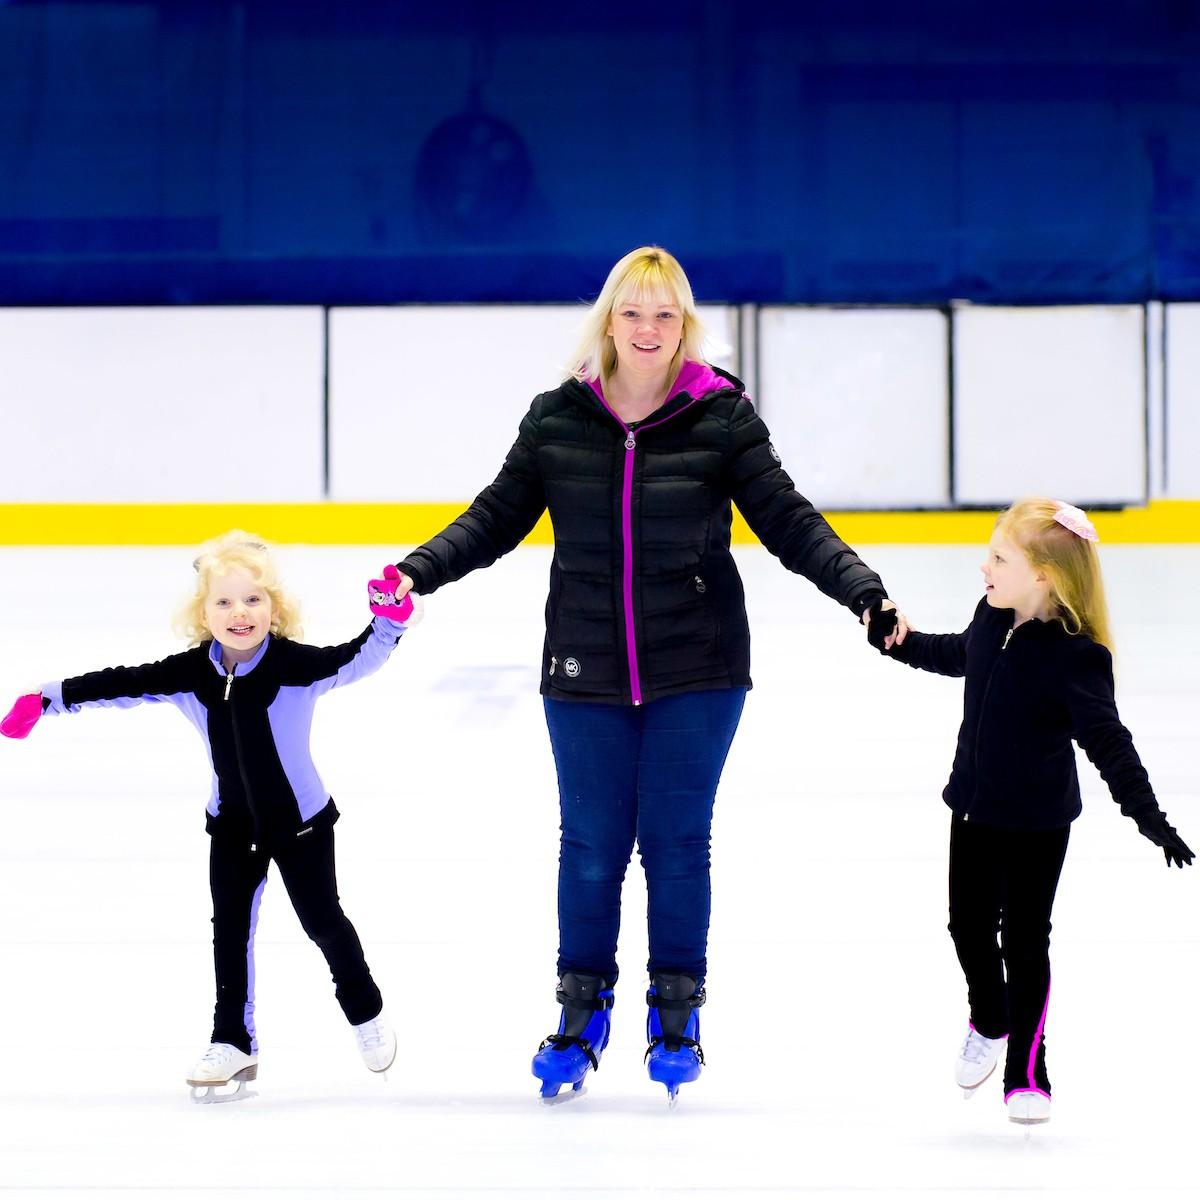 Fitness Skating family